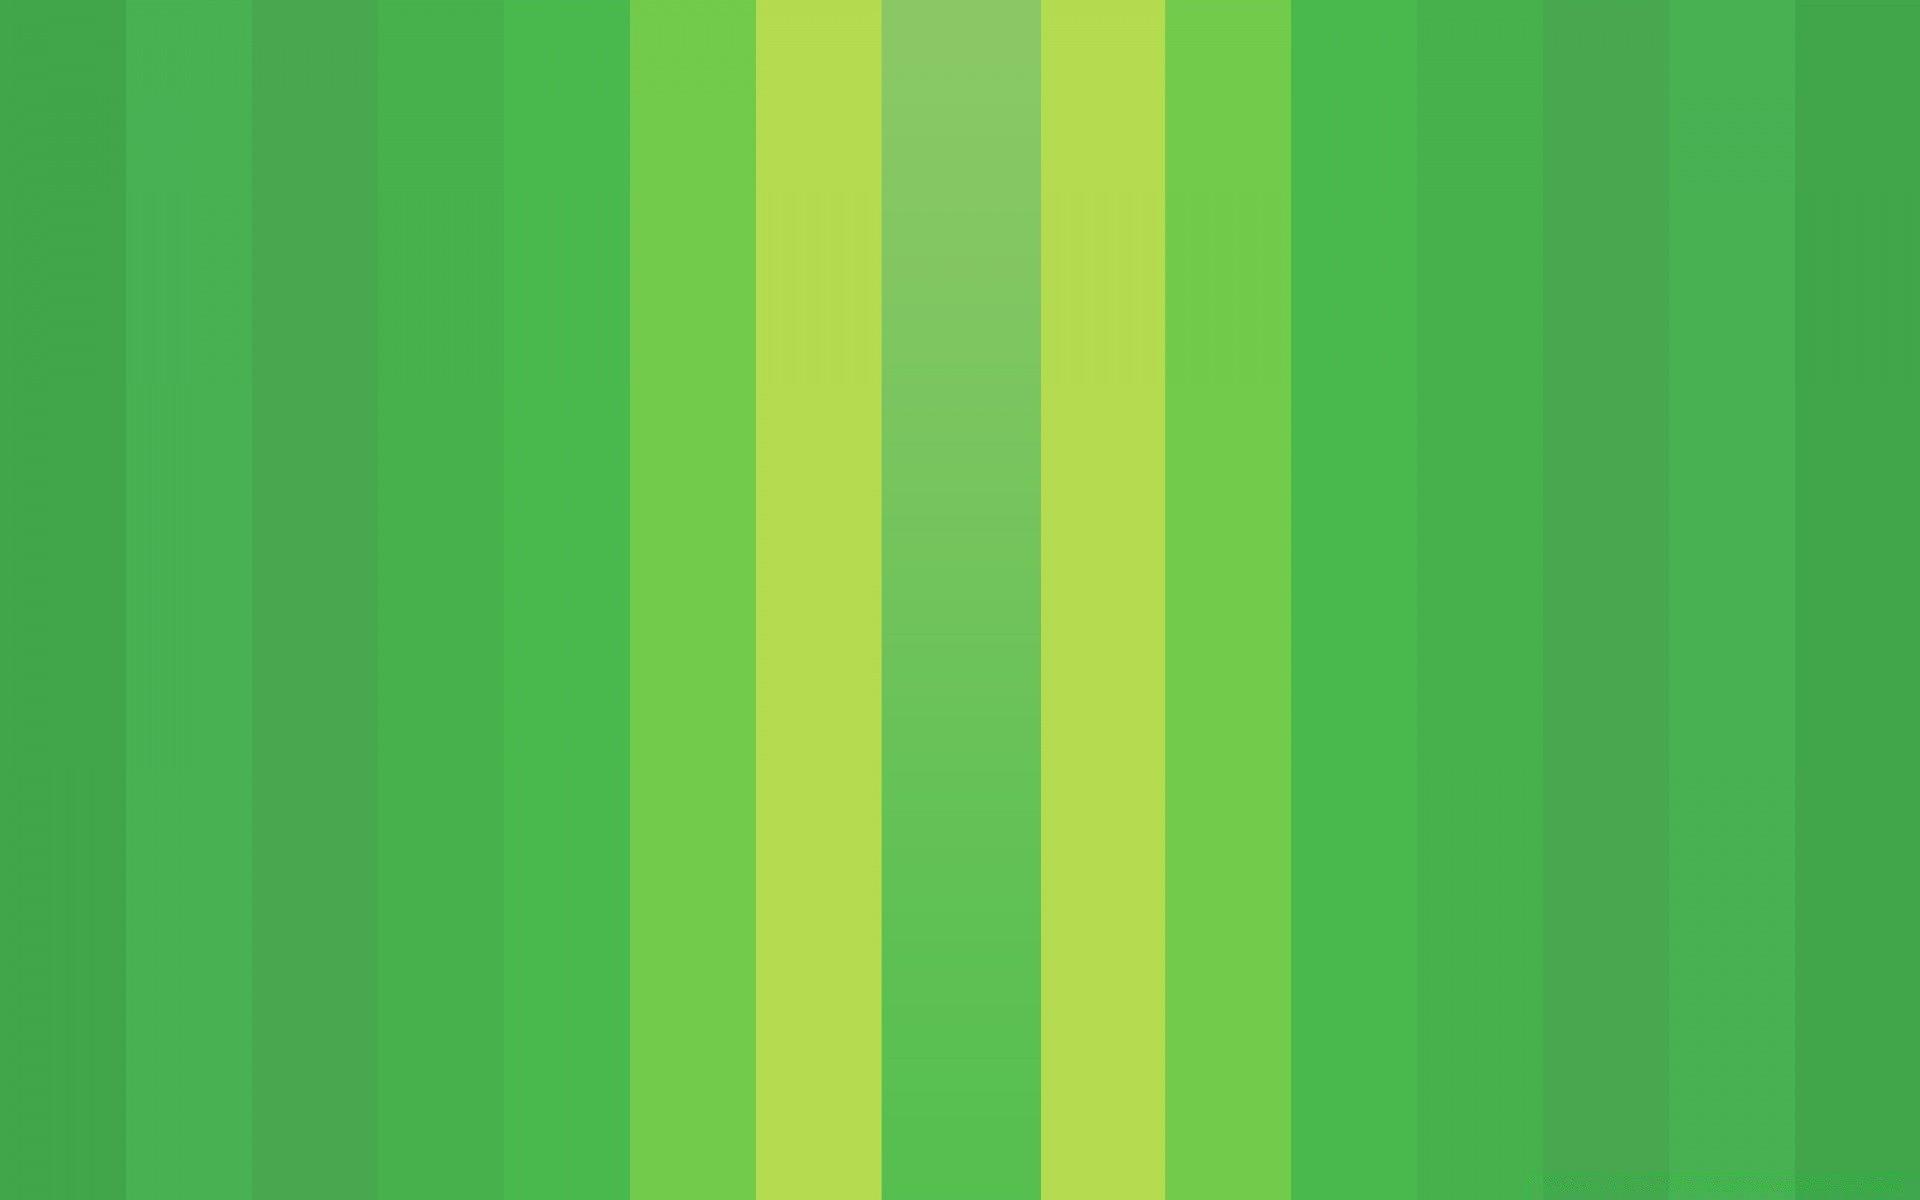 Texture Wallpaper Graphic Design Art Abstract Motley Geometric Retro Artistic Repetition Bright Contemporary Stripe Illustration